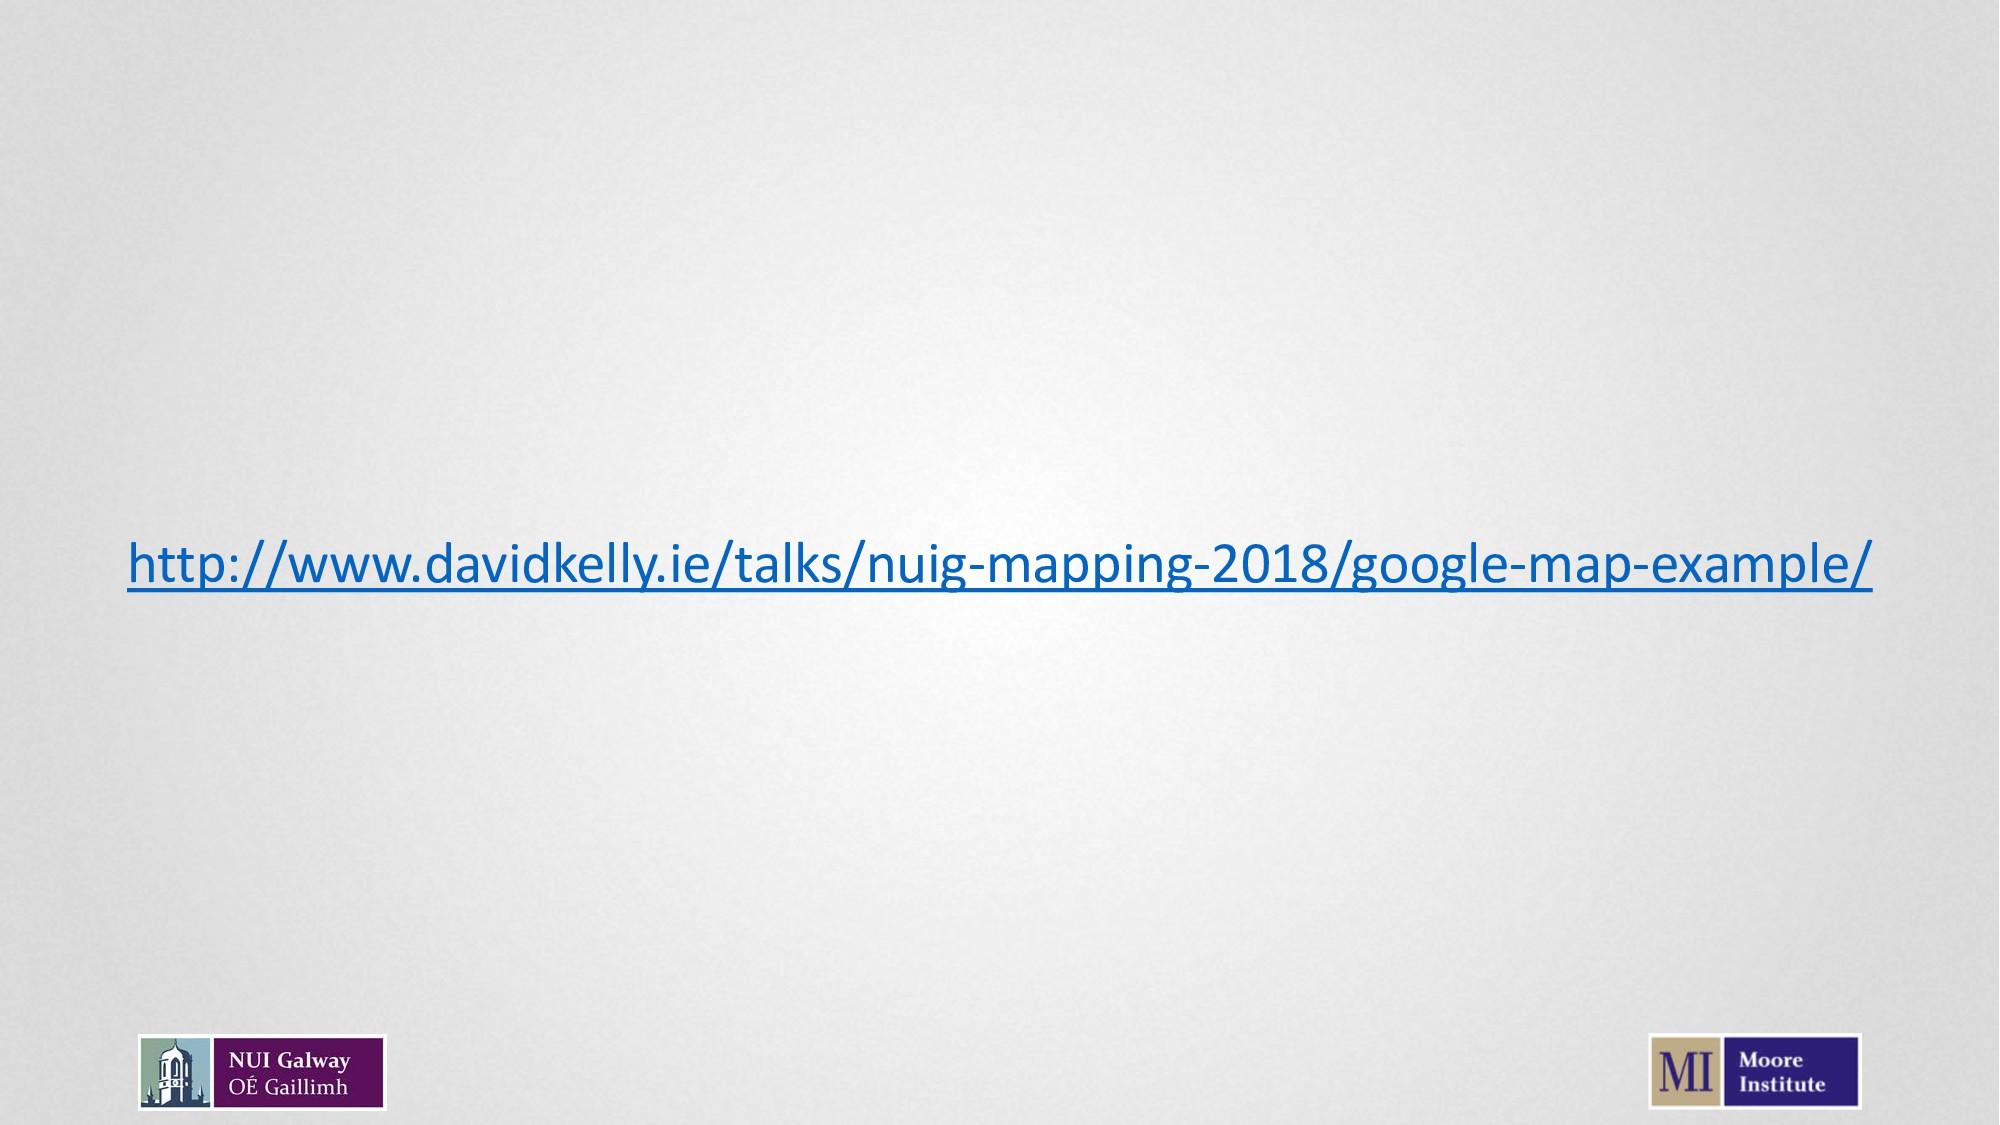 http://www.davidkelly.ie/talks/nuig-mapping-201...